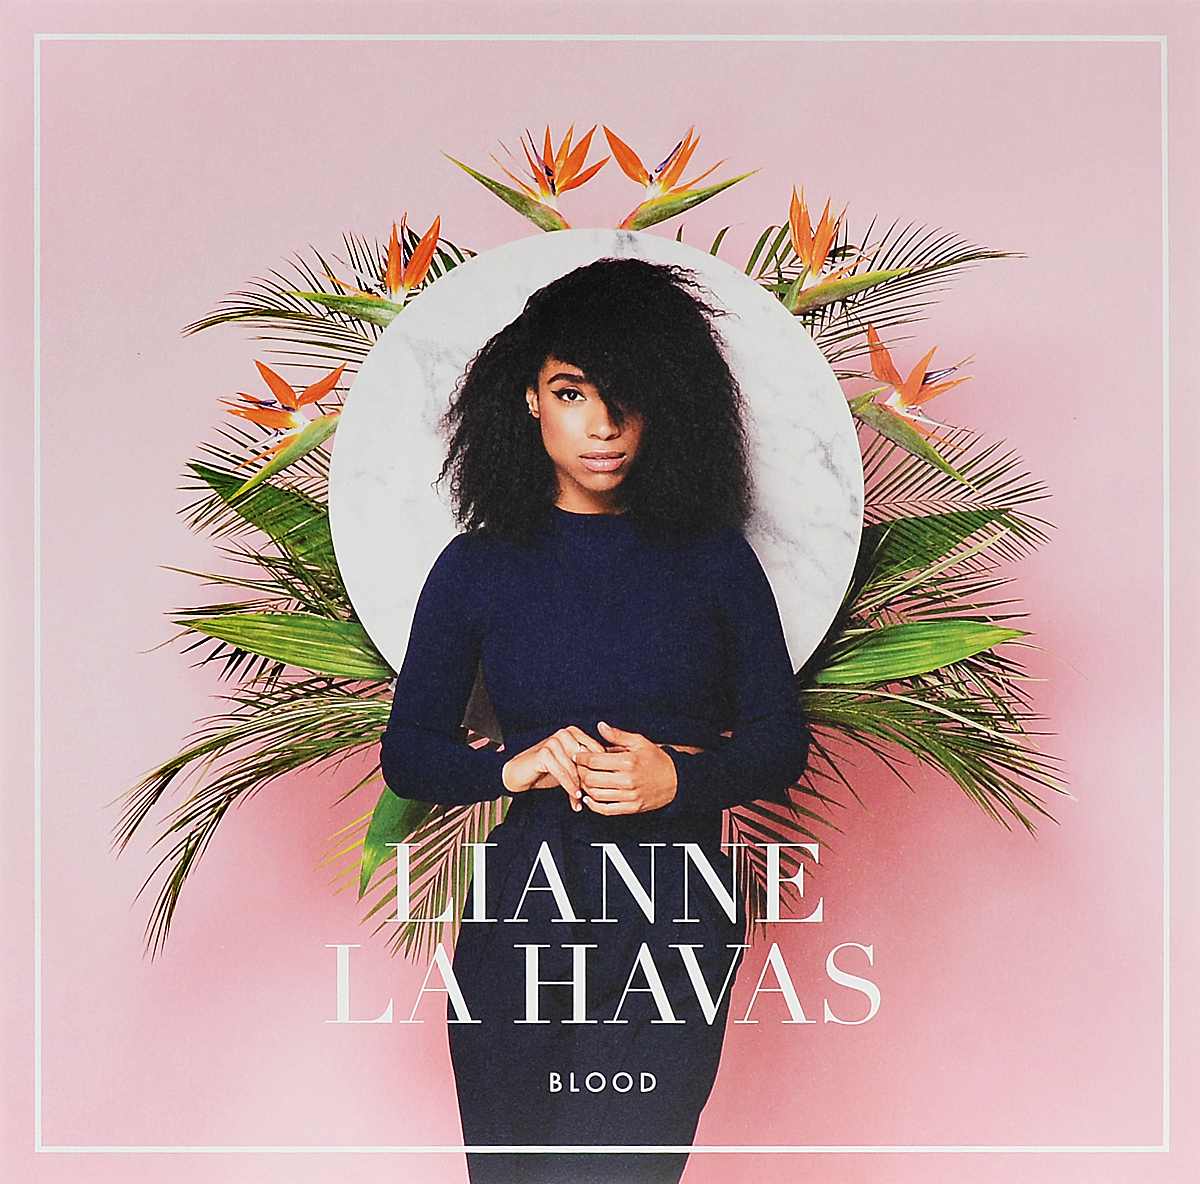 лучшая цена Лианн Ла Хавас Lianne La Havas. Blood (LP)